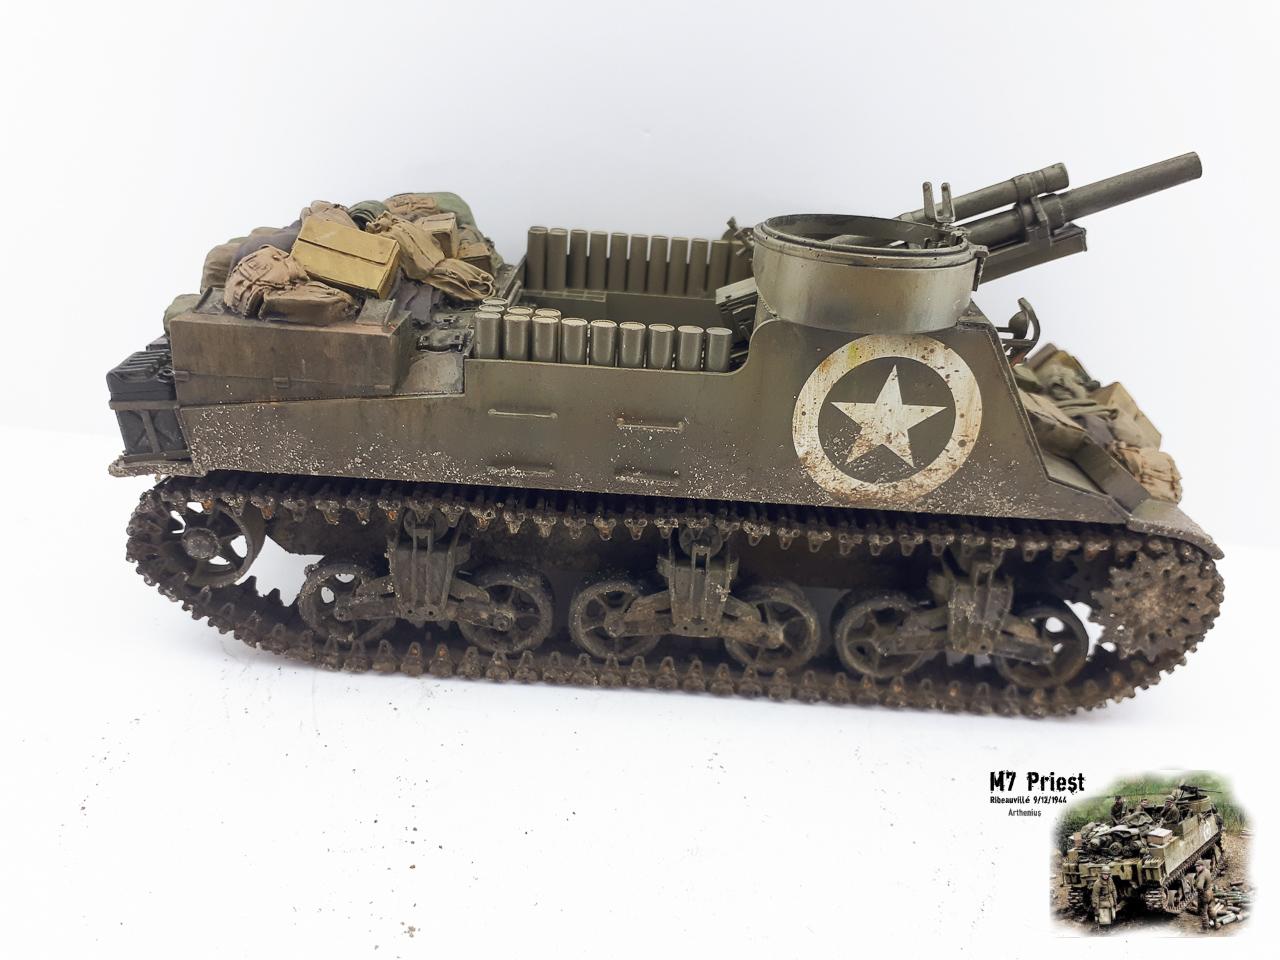 M7 Priest Ribeauvillé 9/12/1944 - Page 3 2018-113